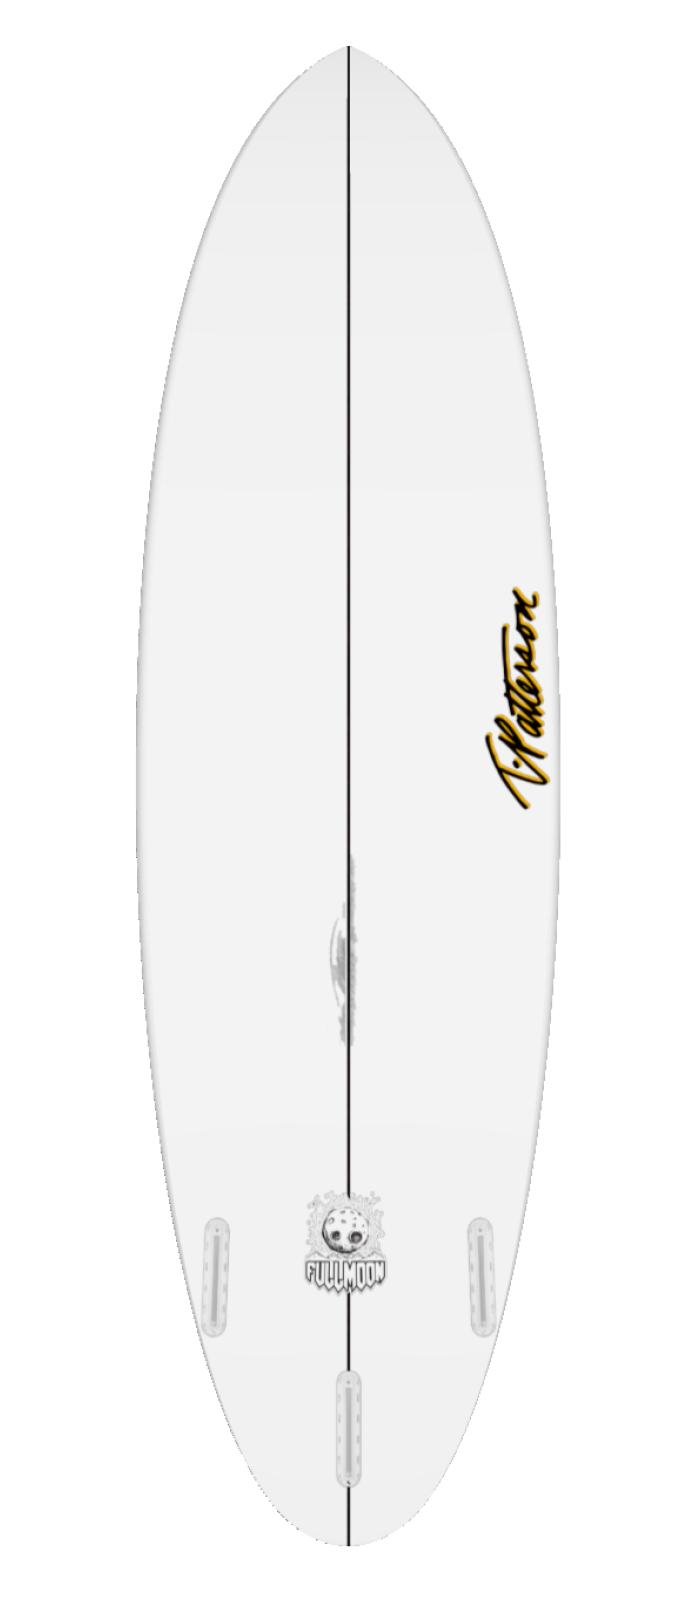 FULL MOON surfboard model bottom